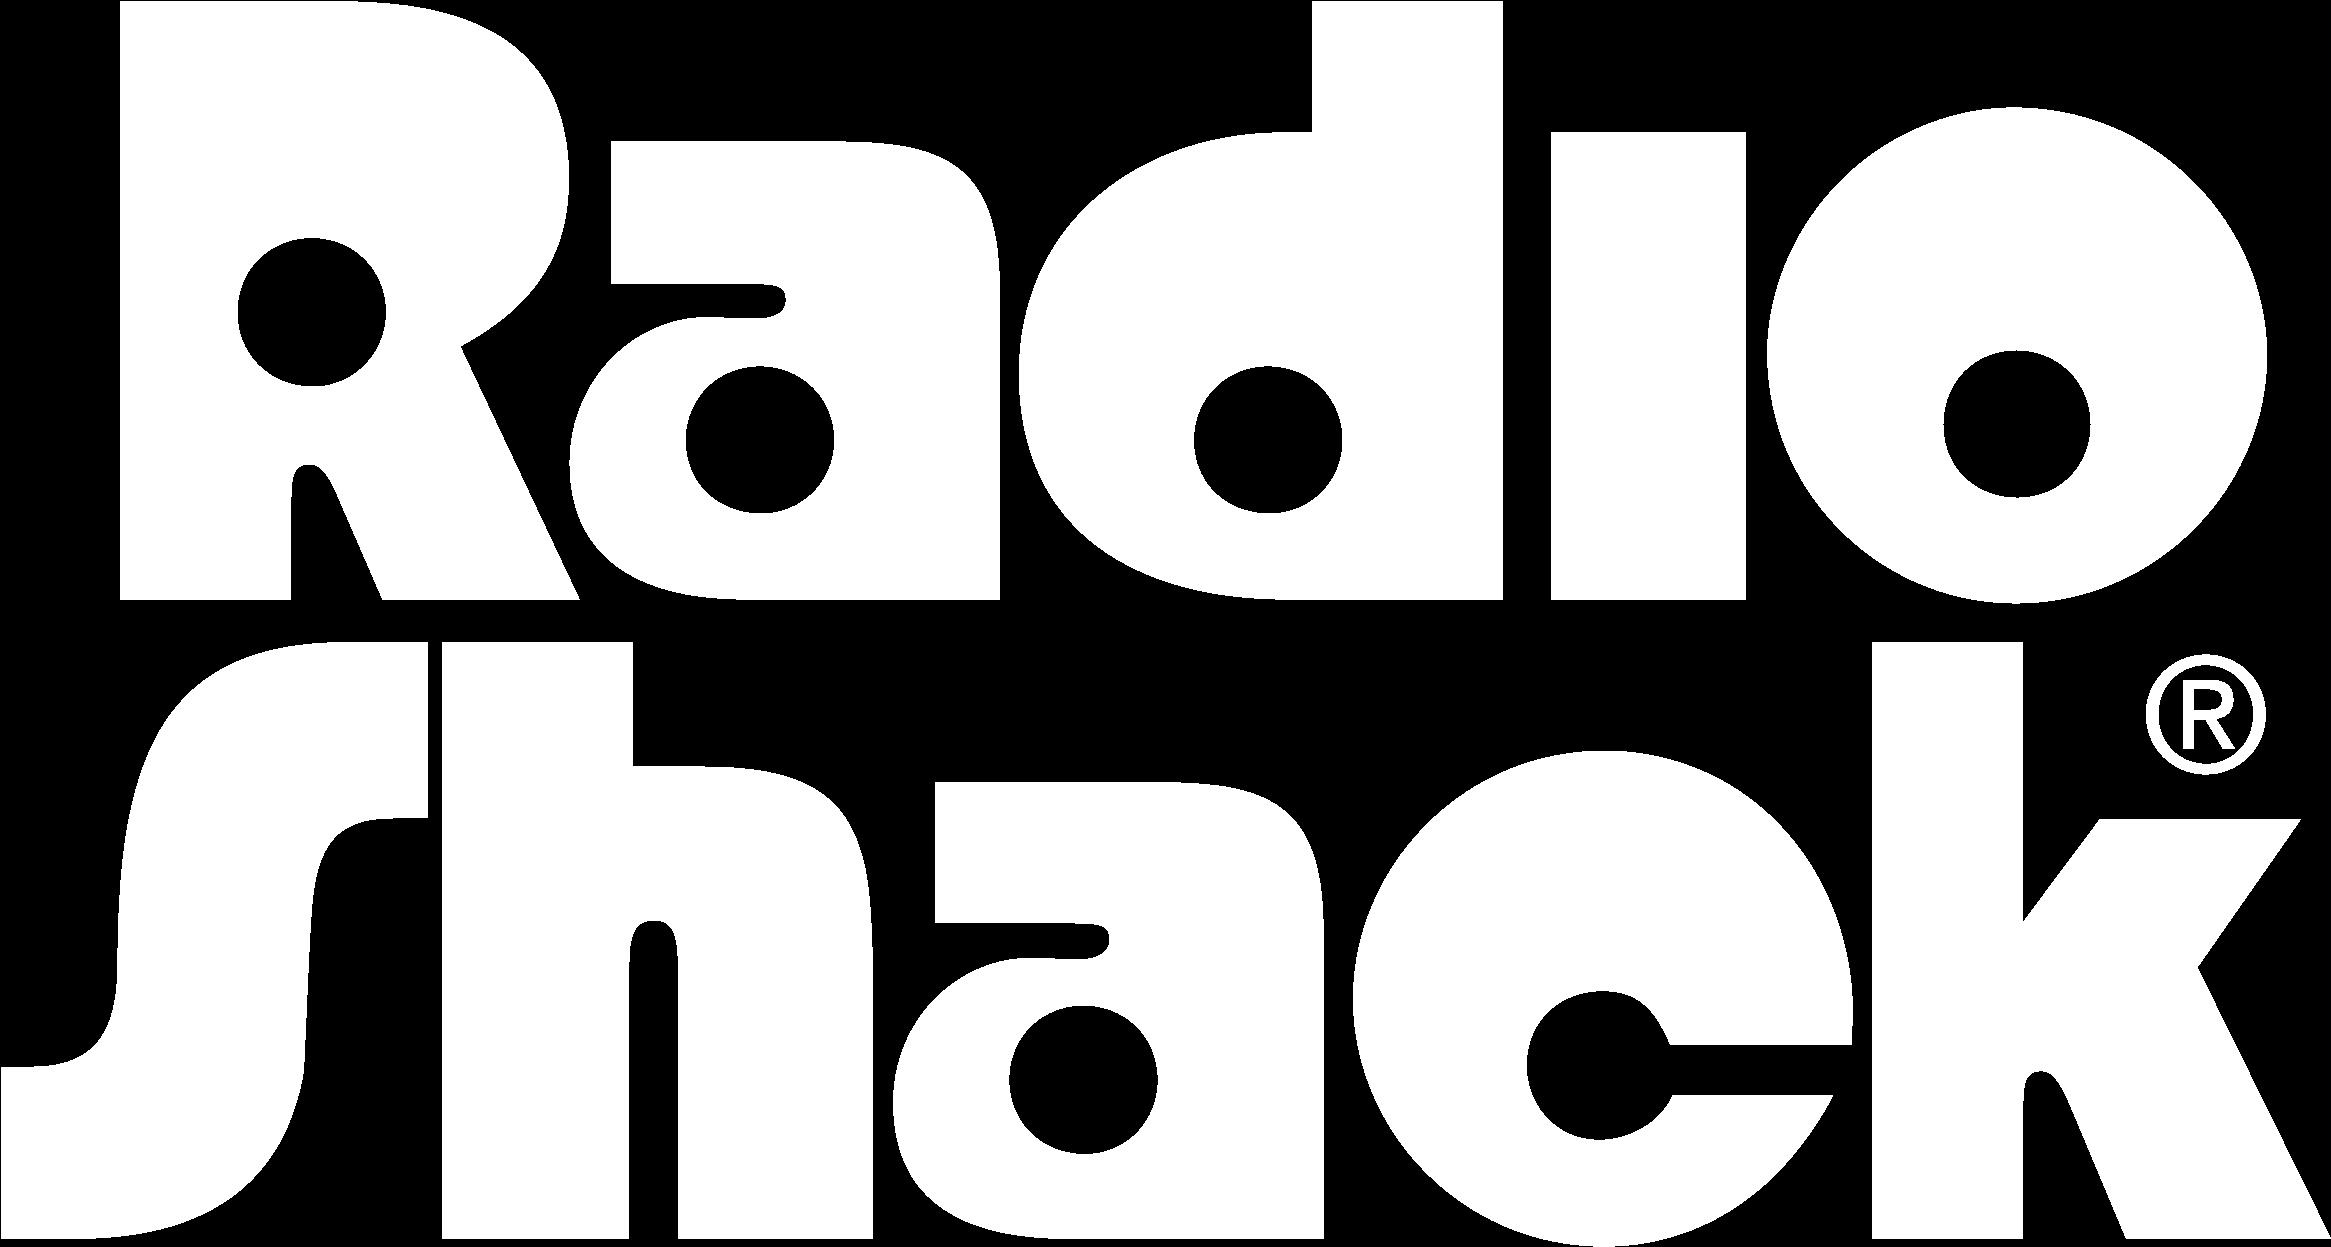 HD Radio Shack Logo Black And White.